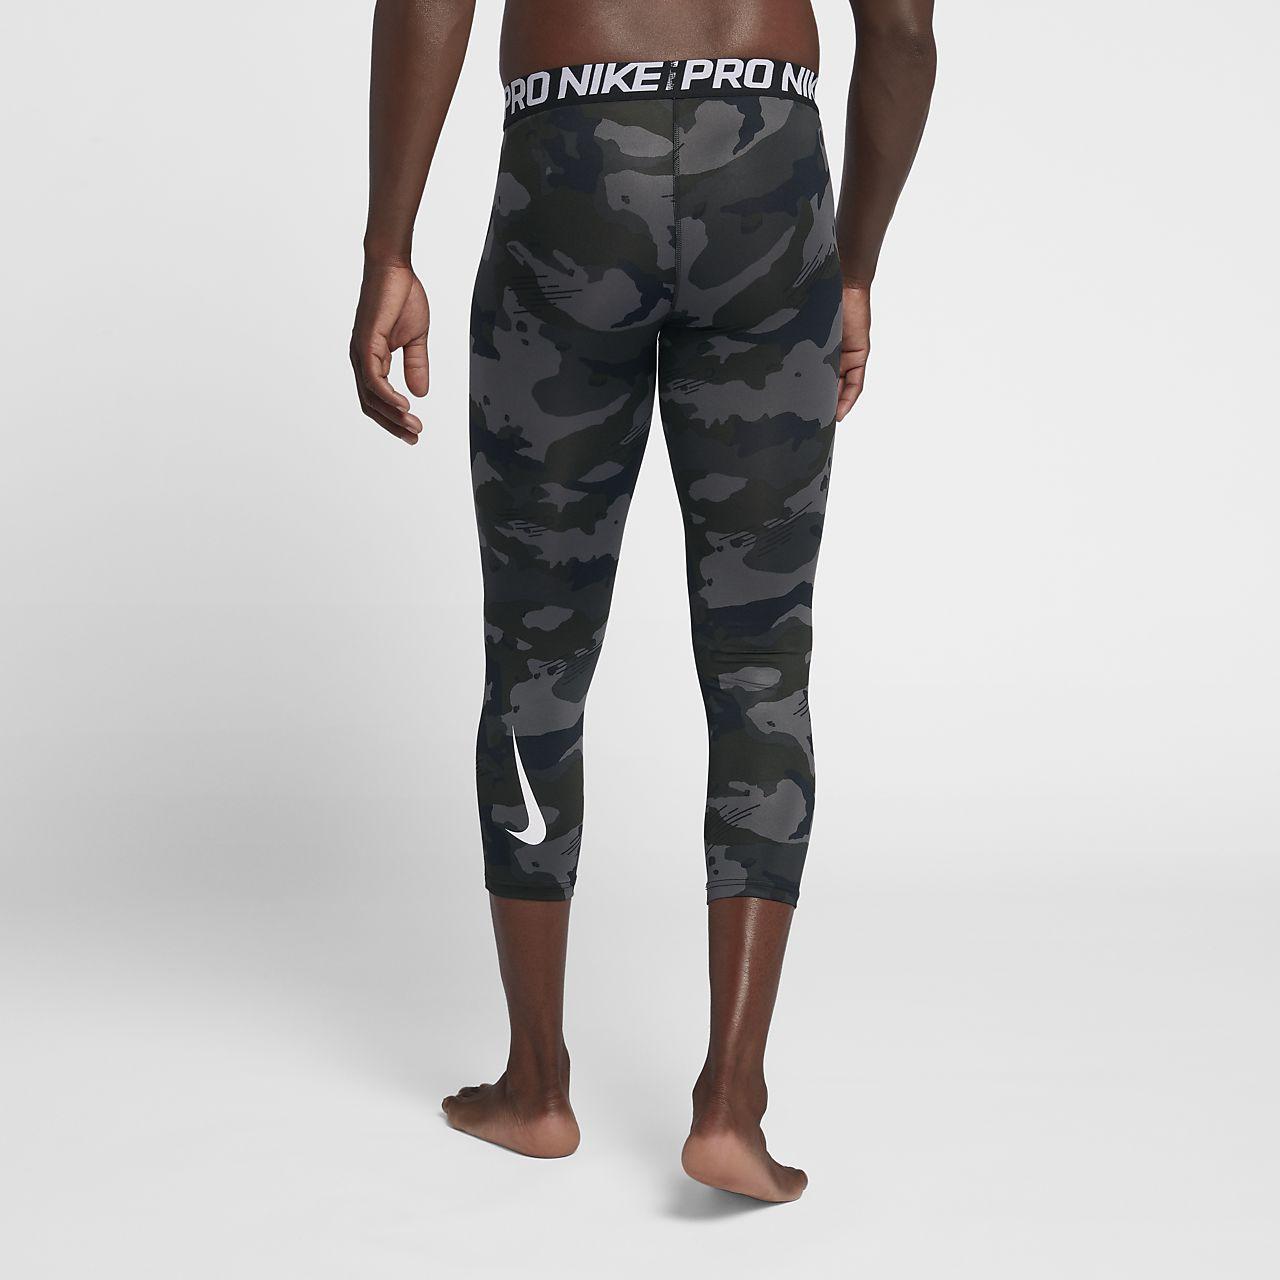 0168ed833f Nike Pro Men's 3/4 Camo Tights. Nike.com ID